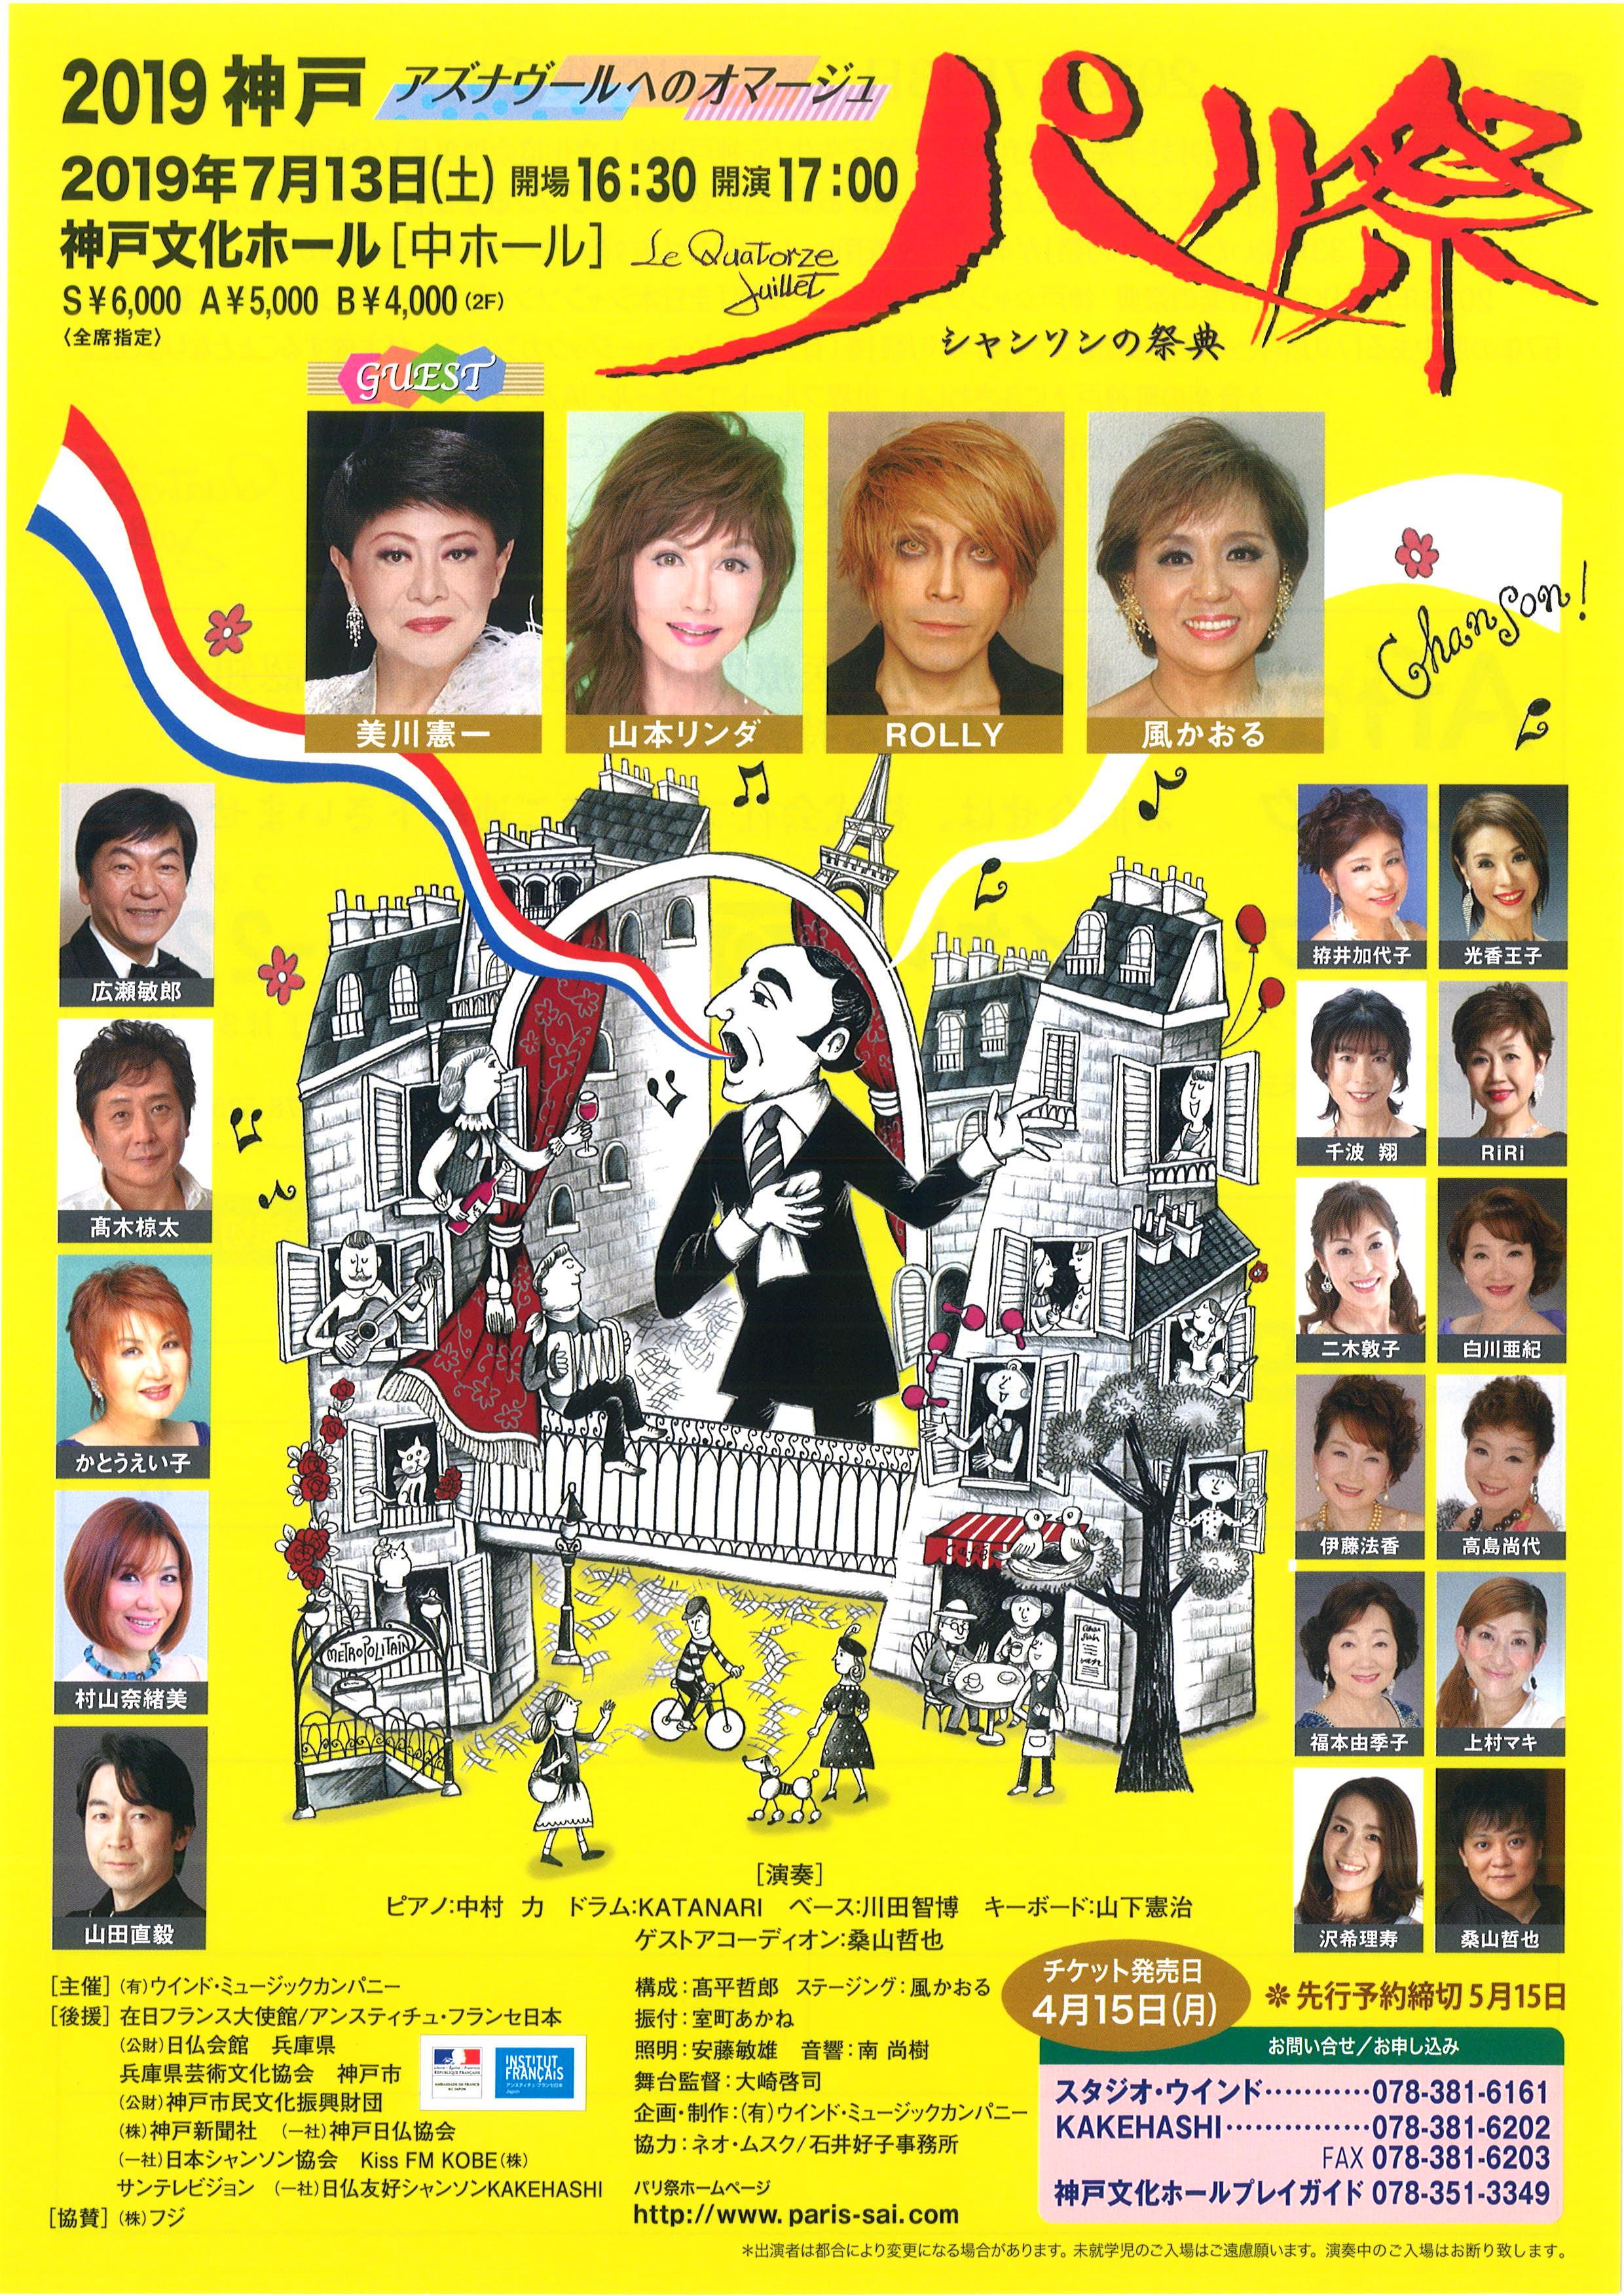 パリ祭 神戸.jpg